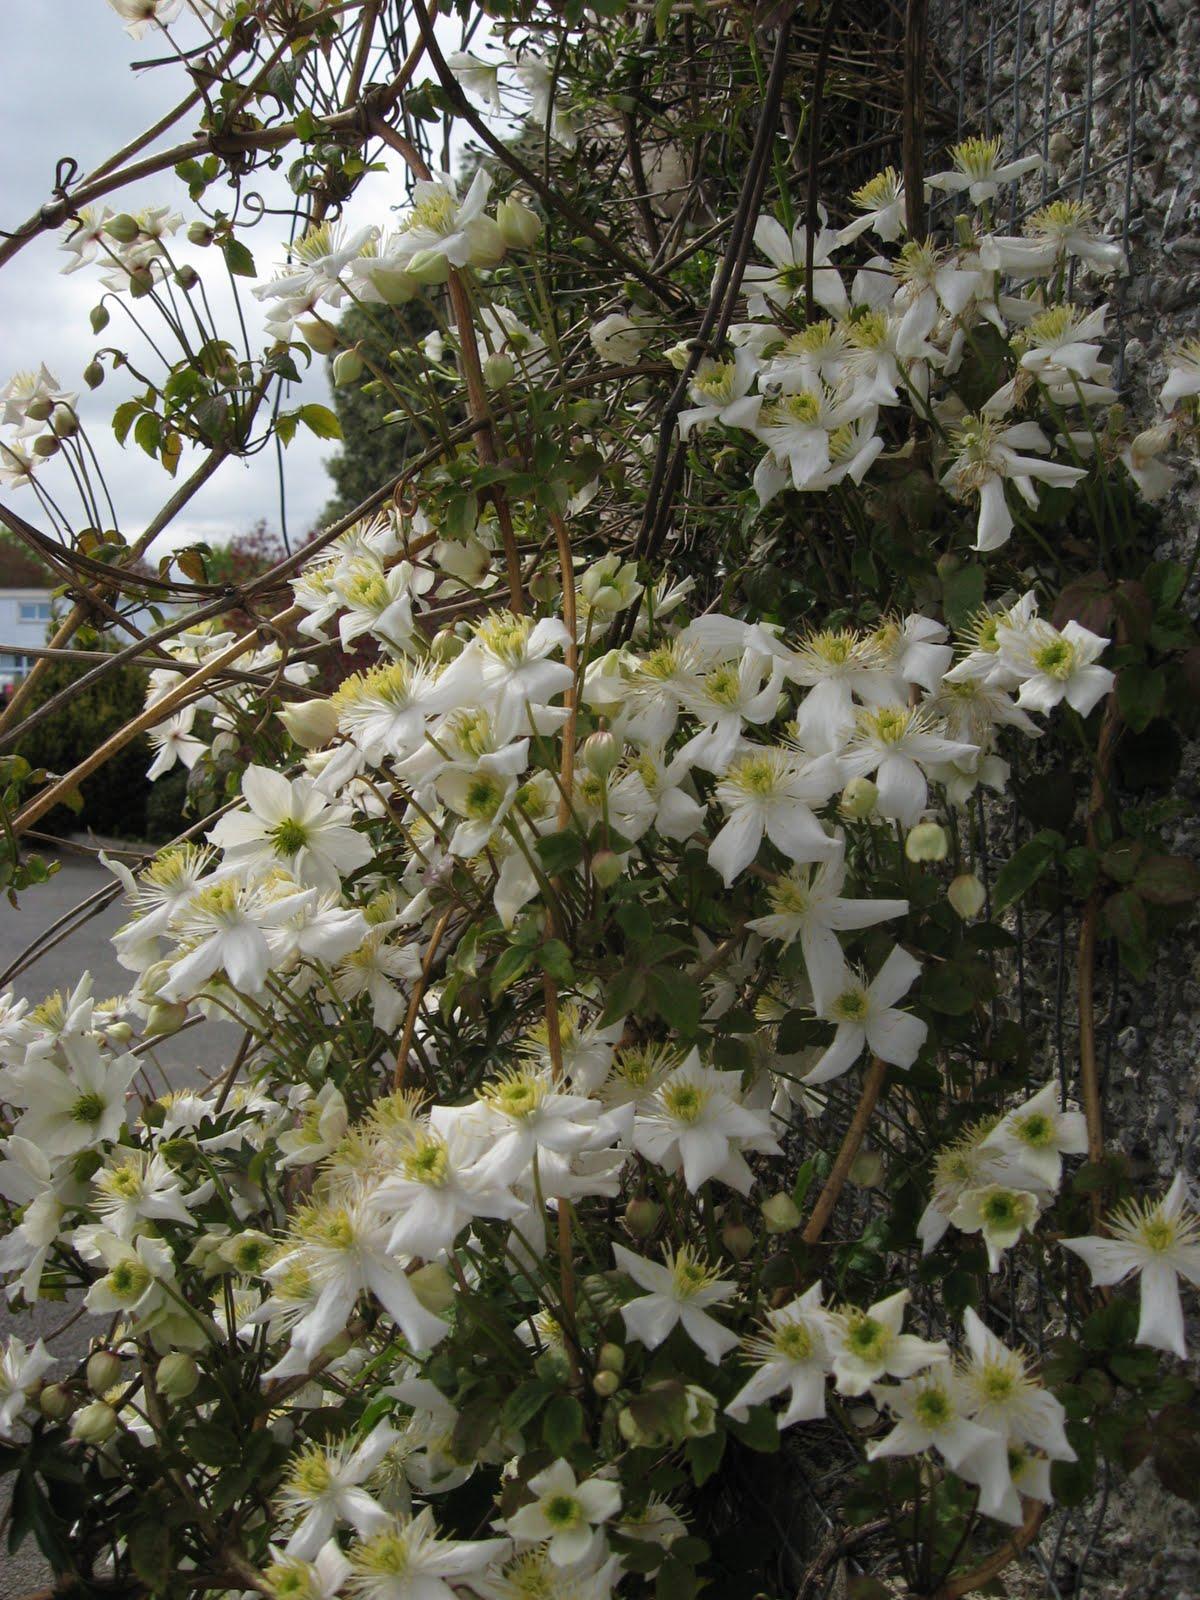 dublin flora clematis montana 39 alba 39. Black Bedroom Furniture Sets. Home Design Ideas